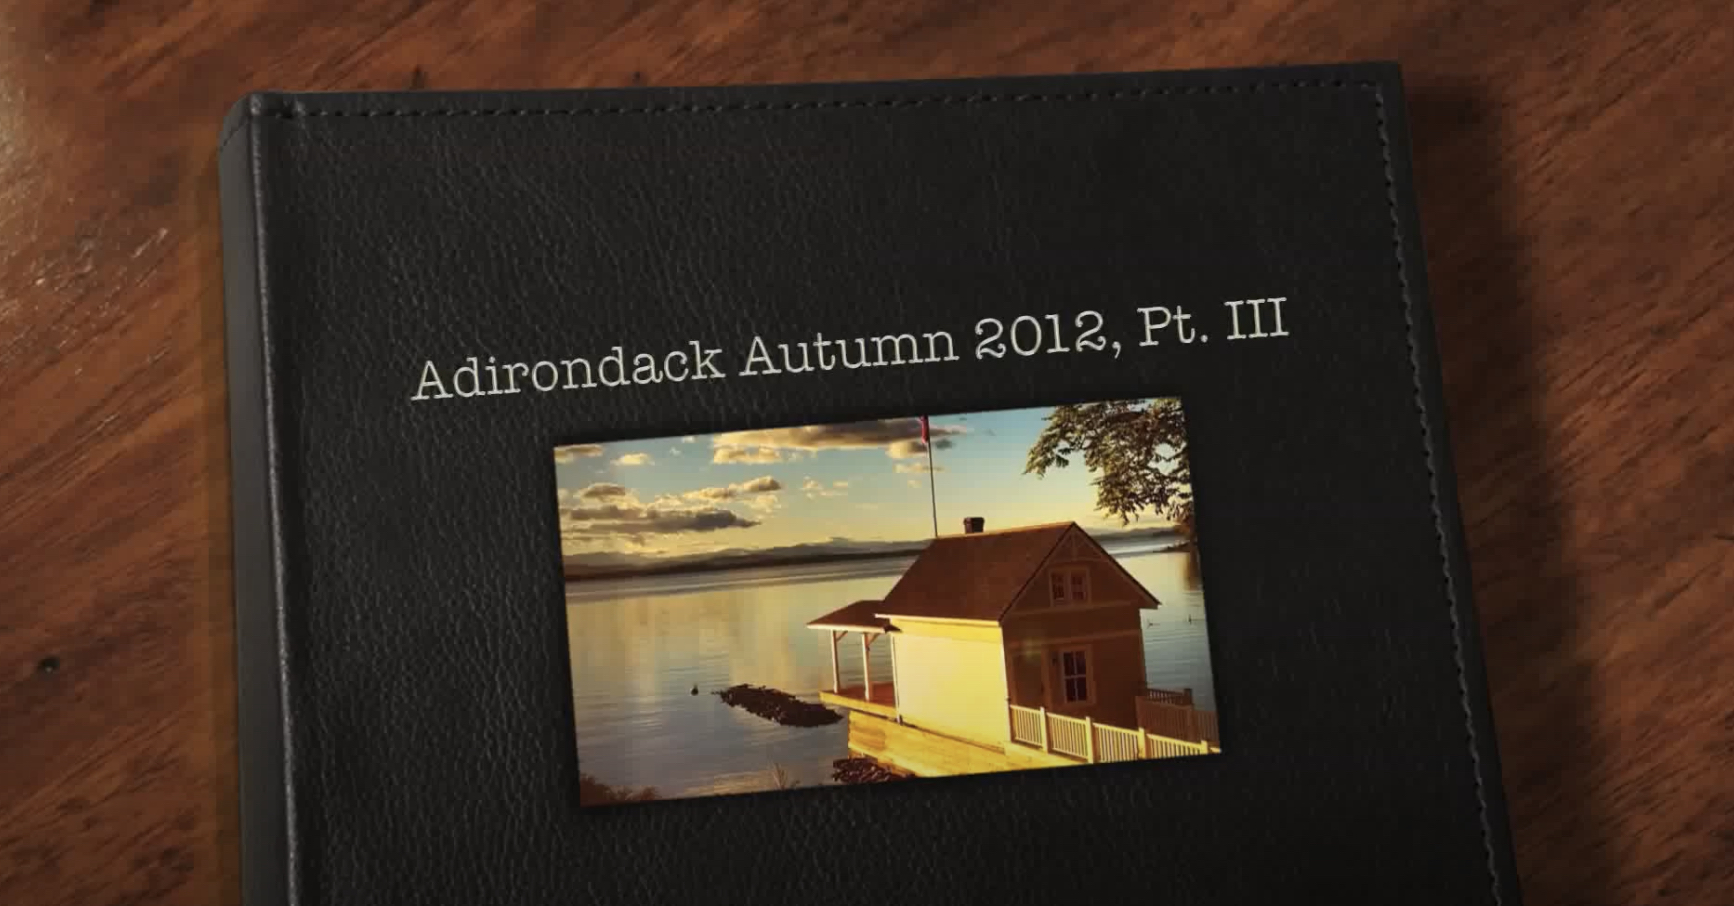 Adirondack Autumn 2012: Part III (Source: Rosslyn Redux)